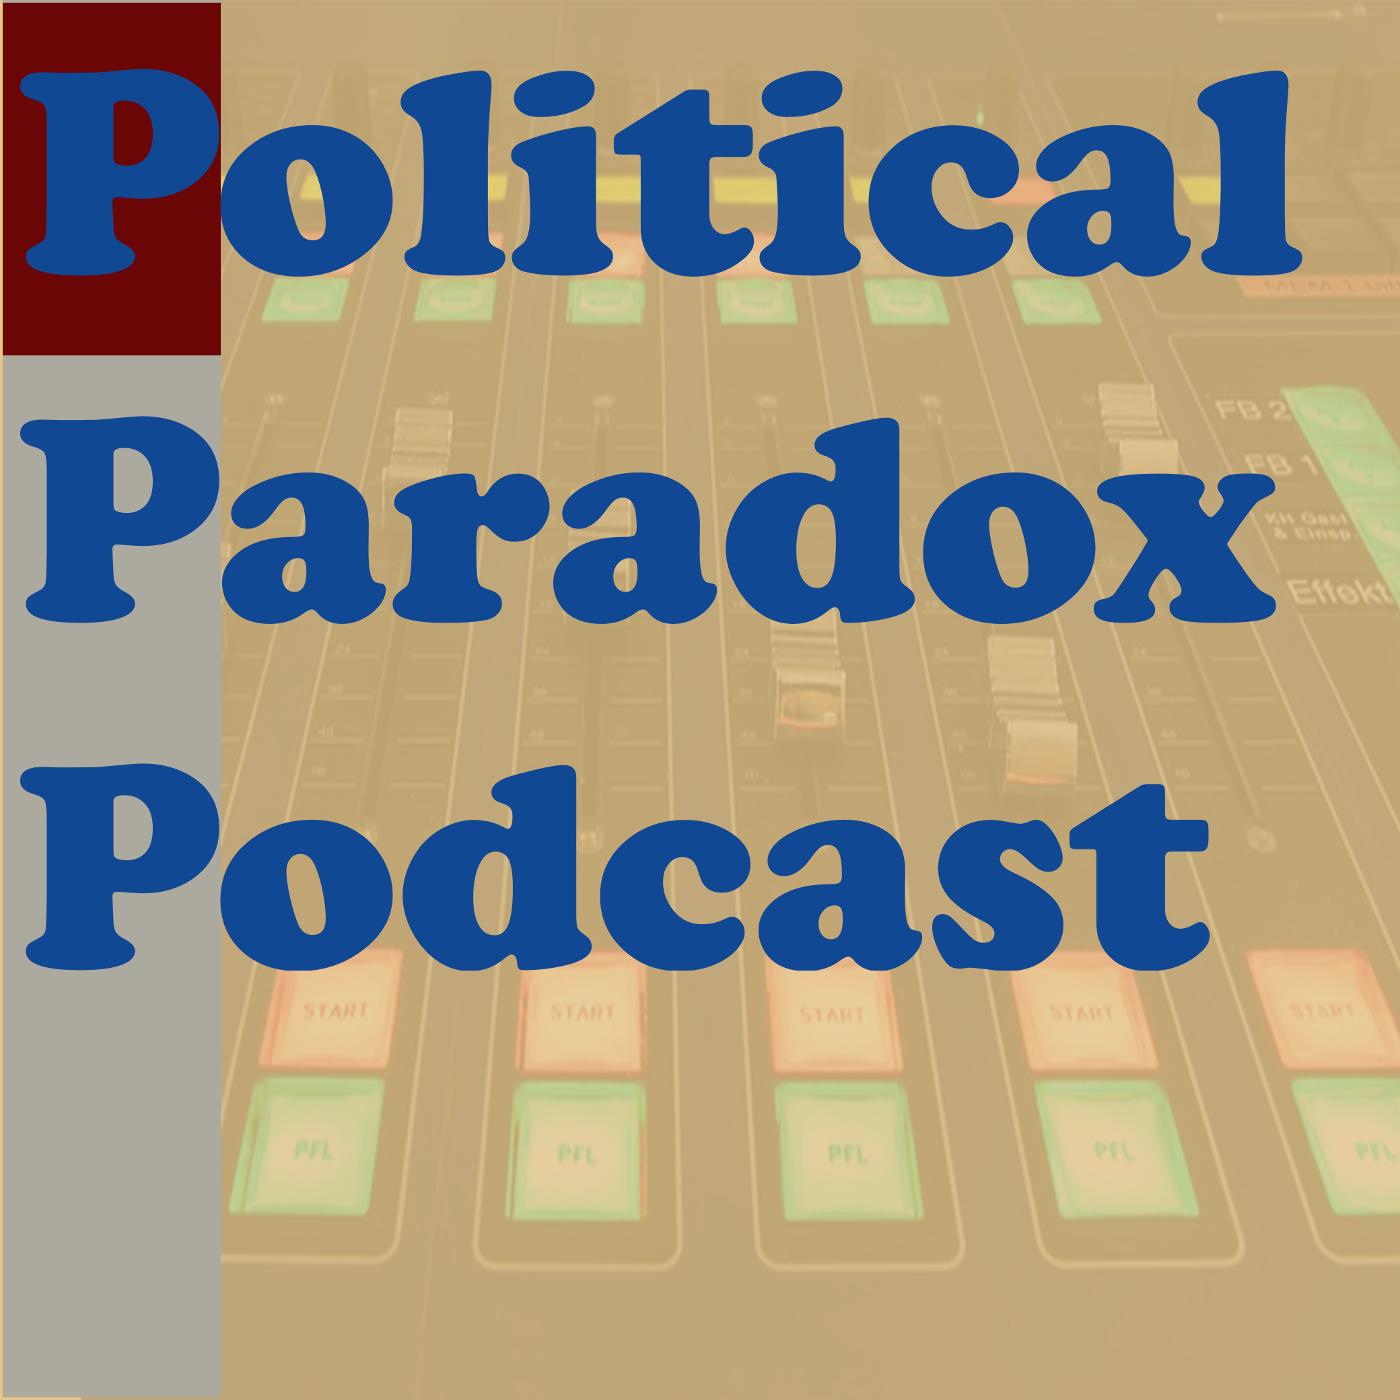 The Political Paradox Podcast show image